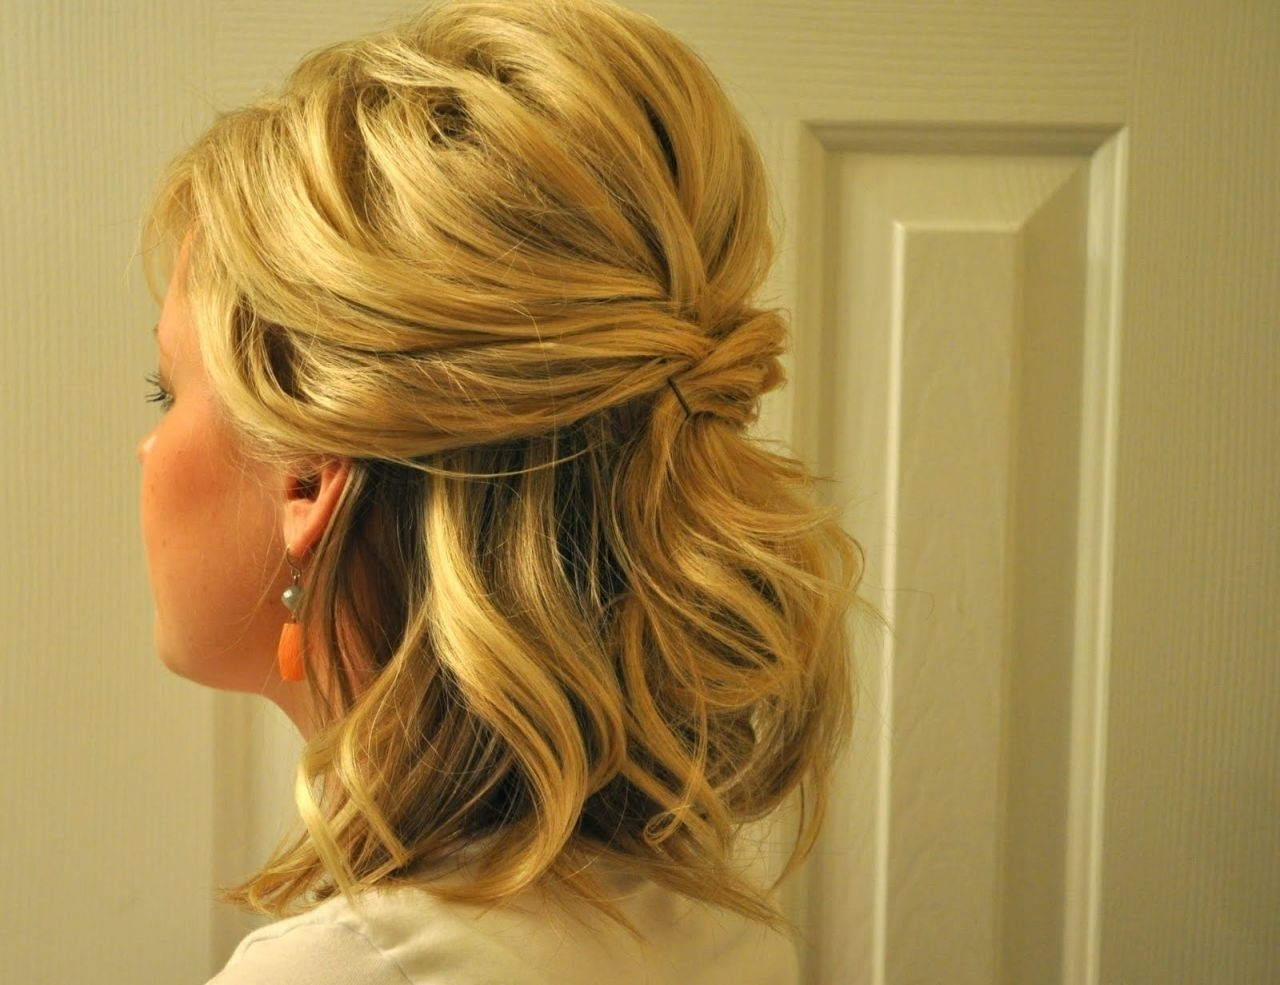 Most Current Down Medium Hair Wedding Hairstyles Within Updos For Medium Hair Half Up Half Down Half Up Half Down Wedding (View 9 of 15)